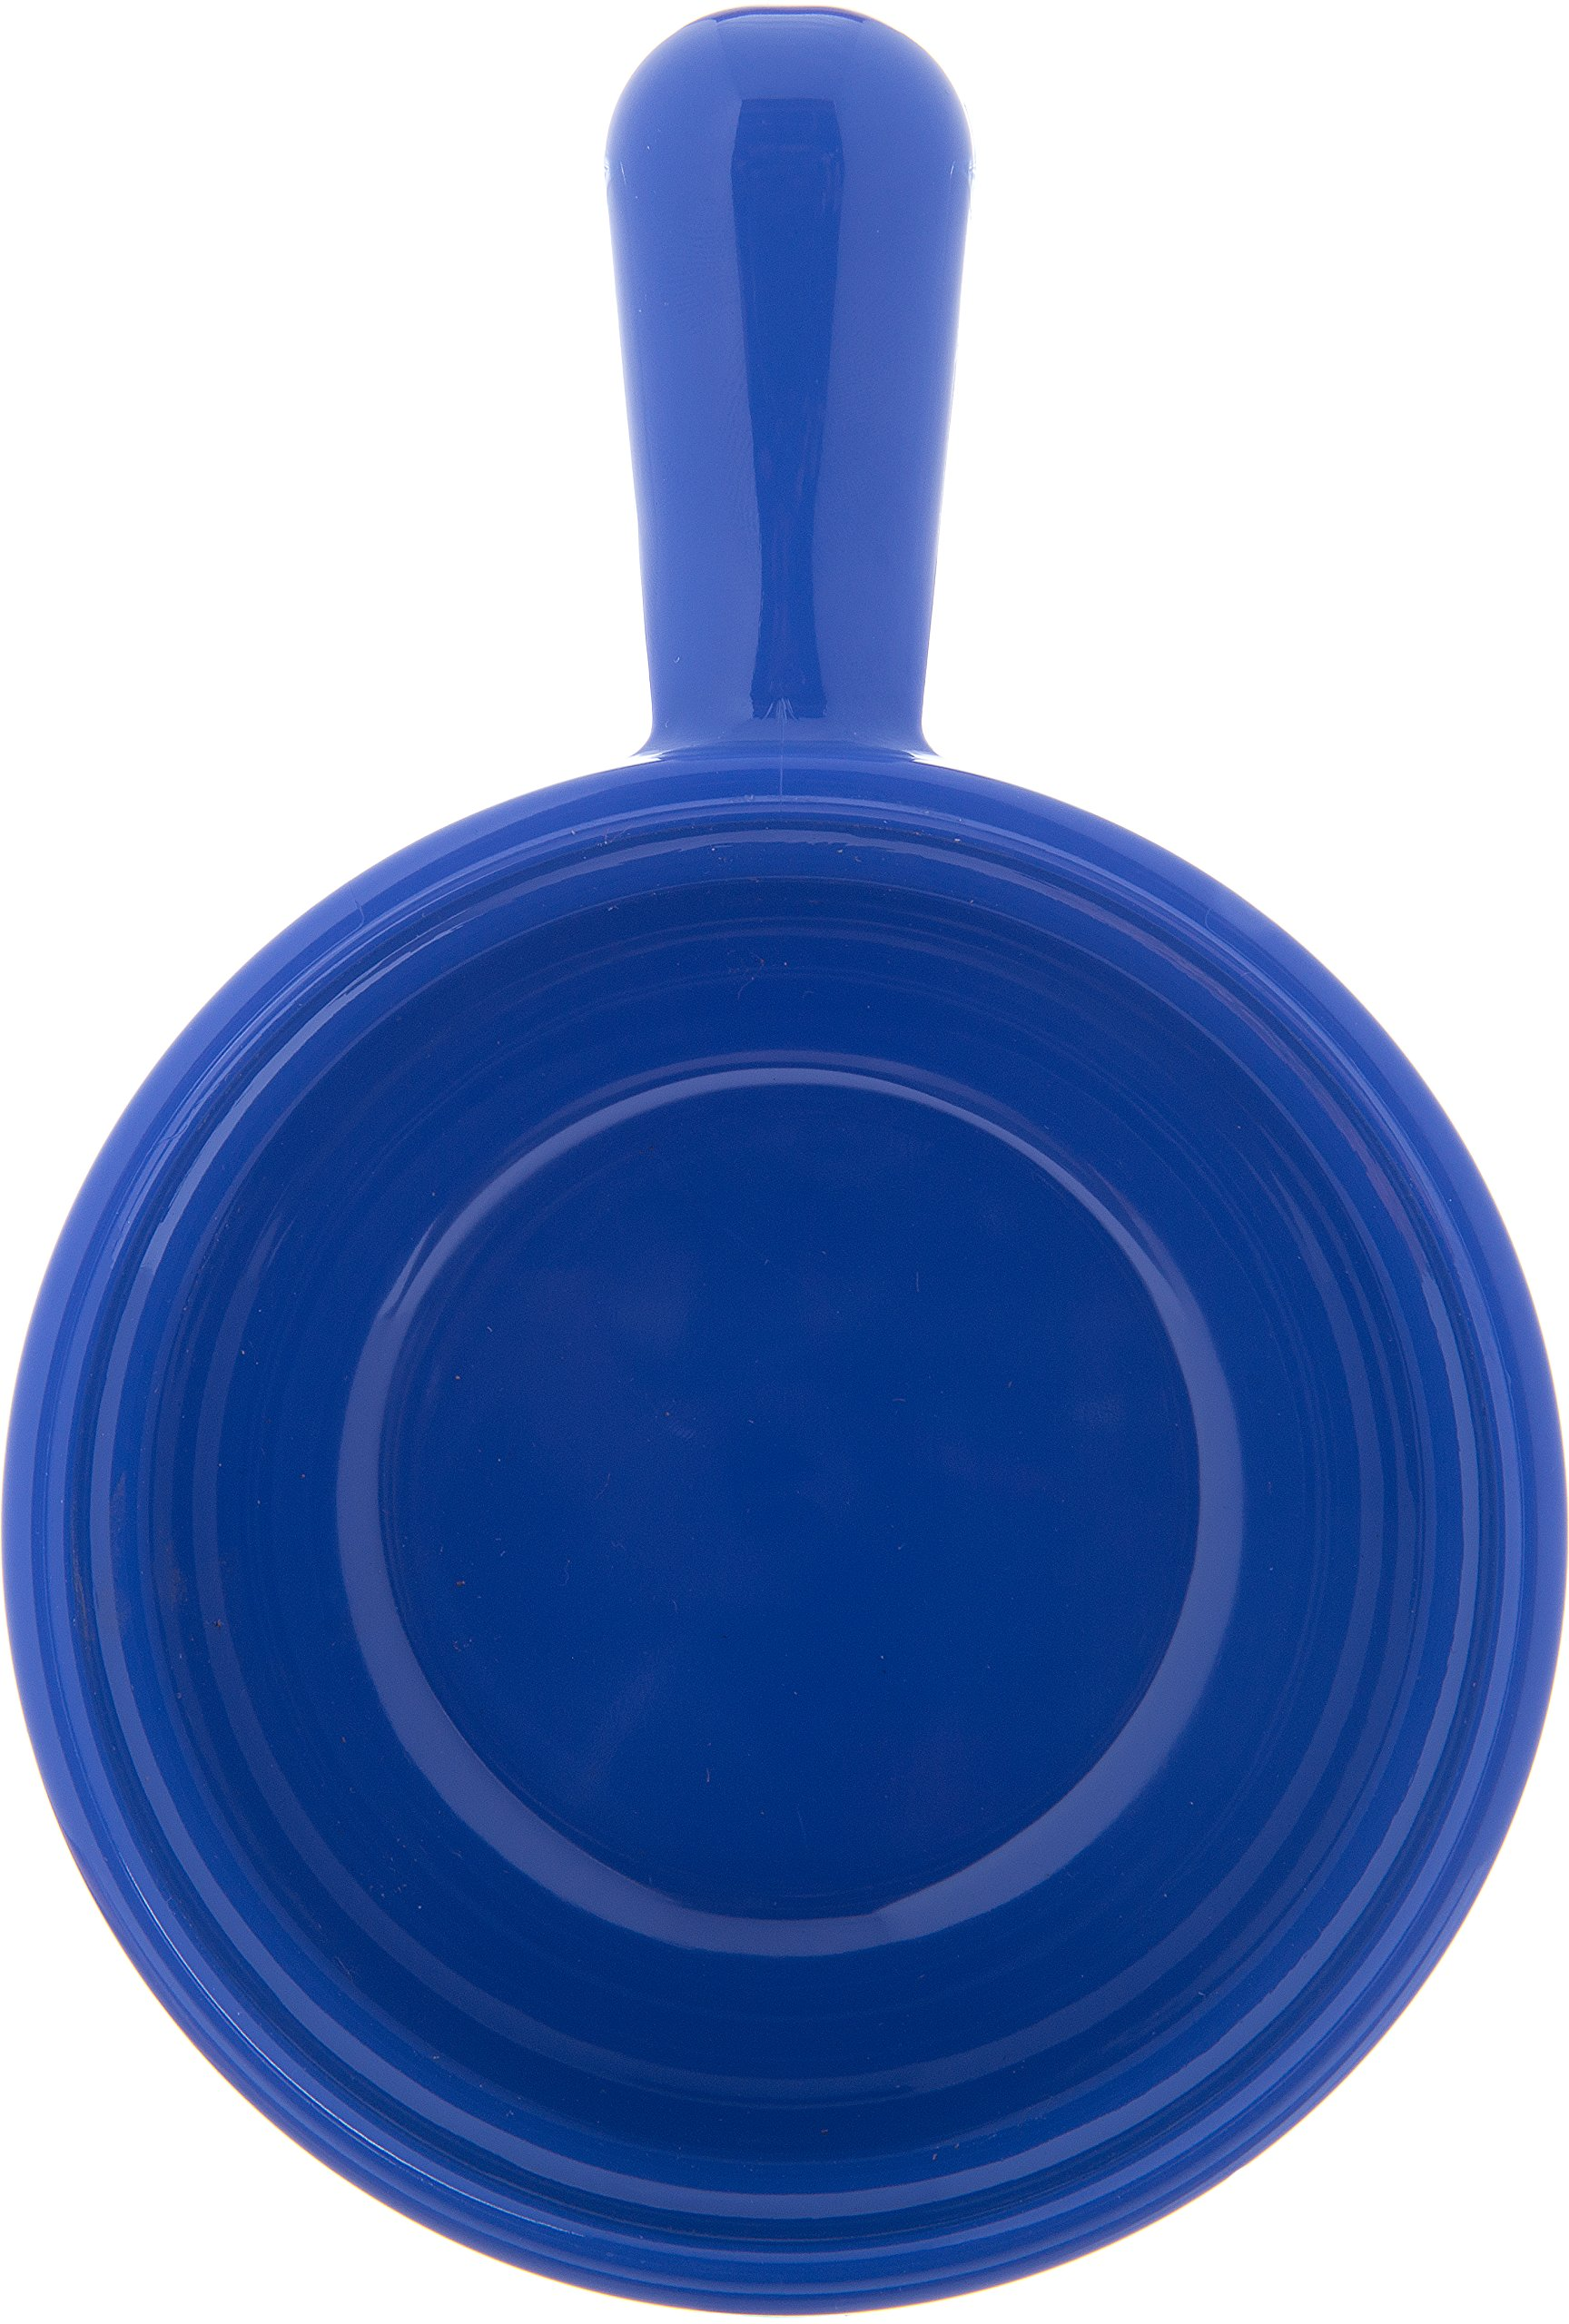 Carlisle 700614 Plastic Handled Soup Bowl, 8 oz., Ocean Blue (Pack of 24) by Carlisle (Image #3)